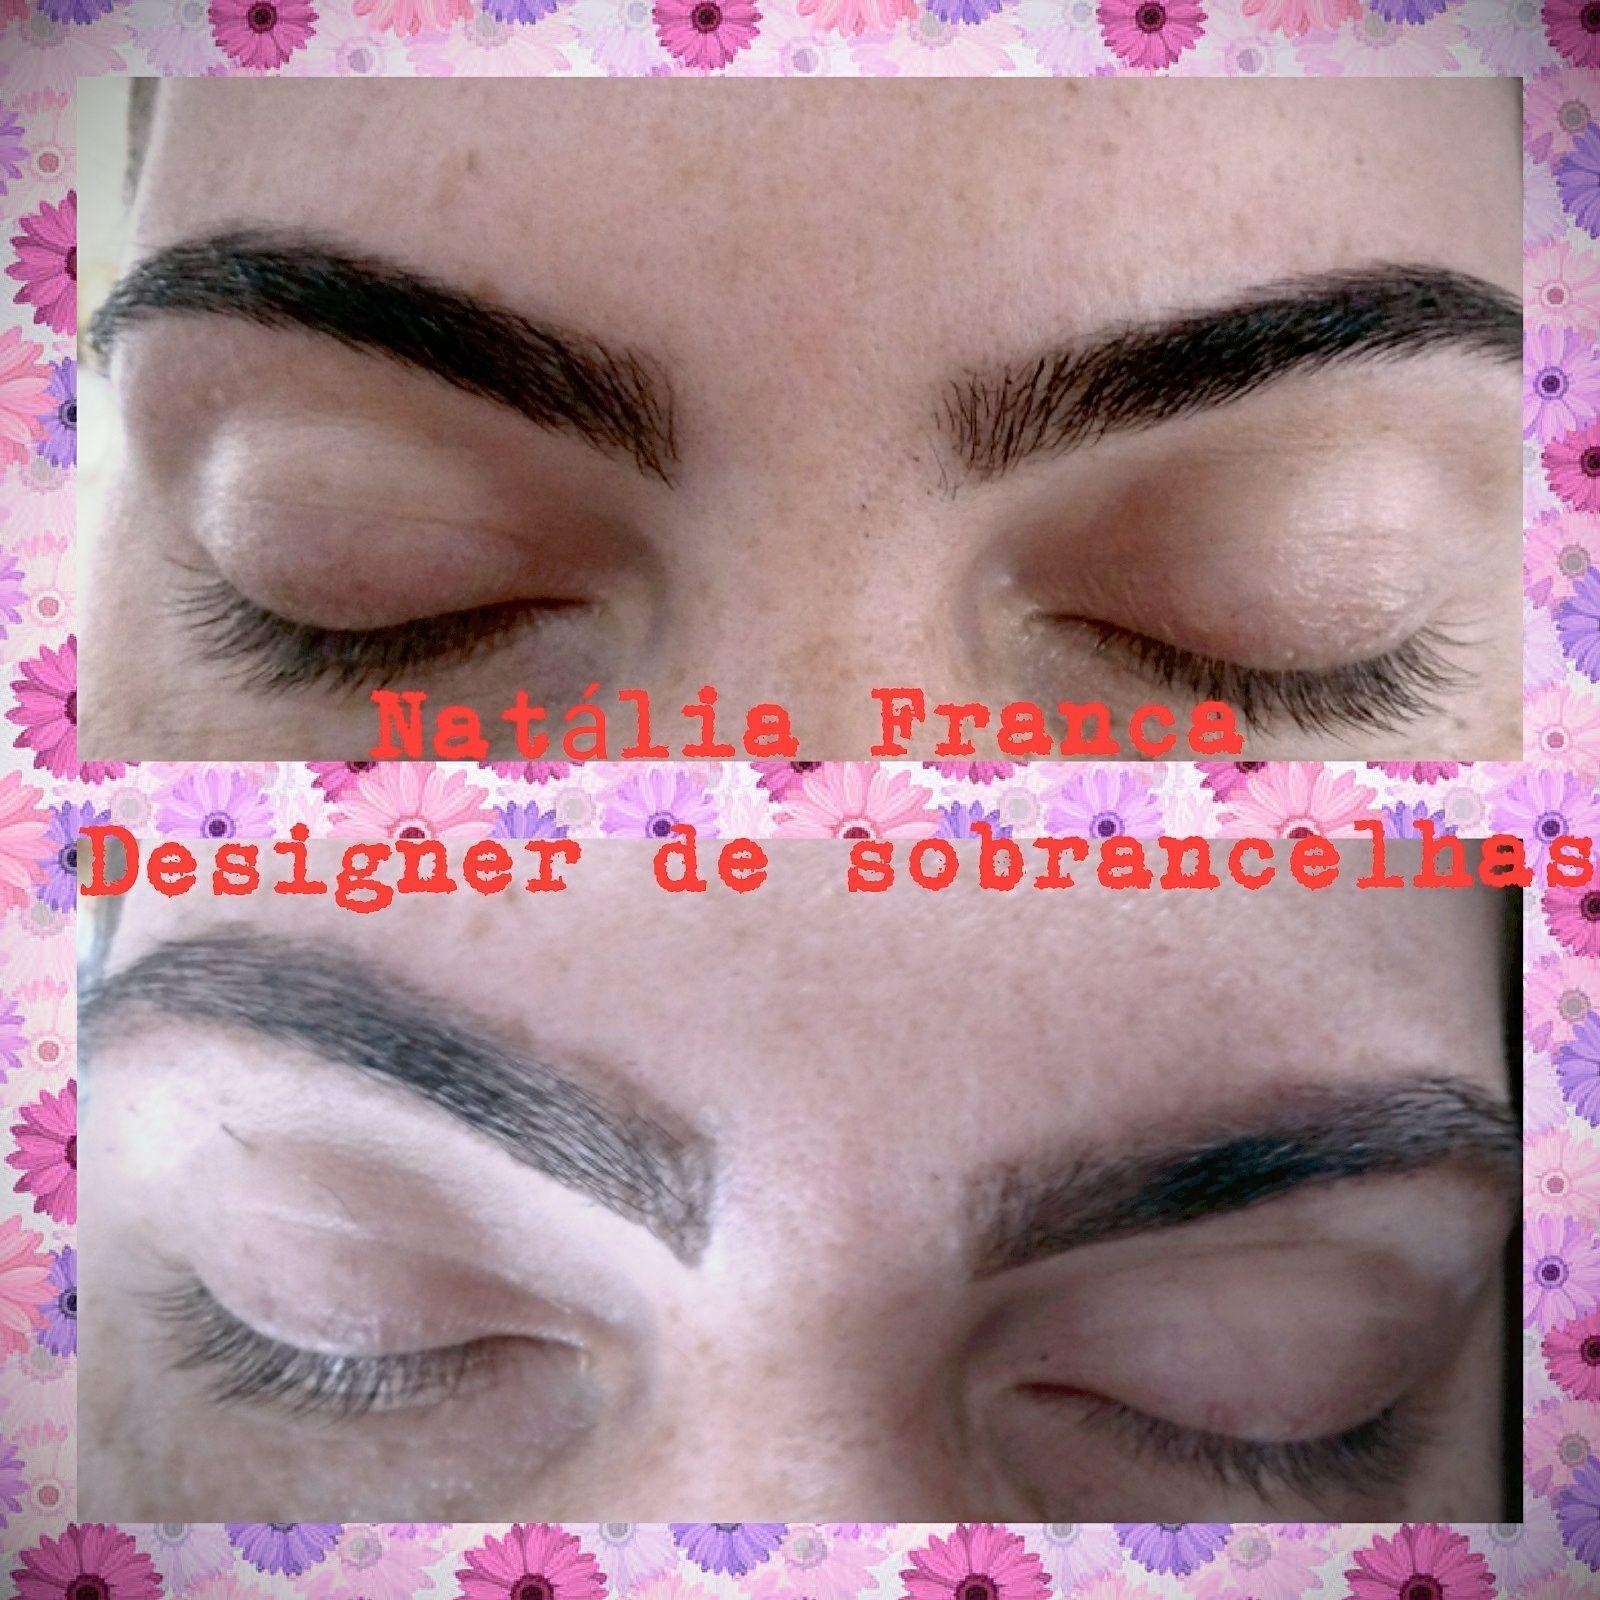 estética depilador(a) depilador(a) depilador(a) depilador(a) designer de sobrancelhas designer de sobrancelhas